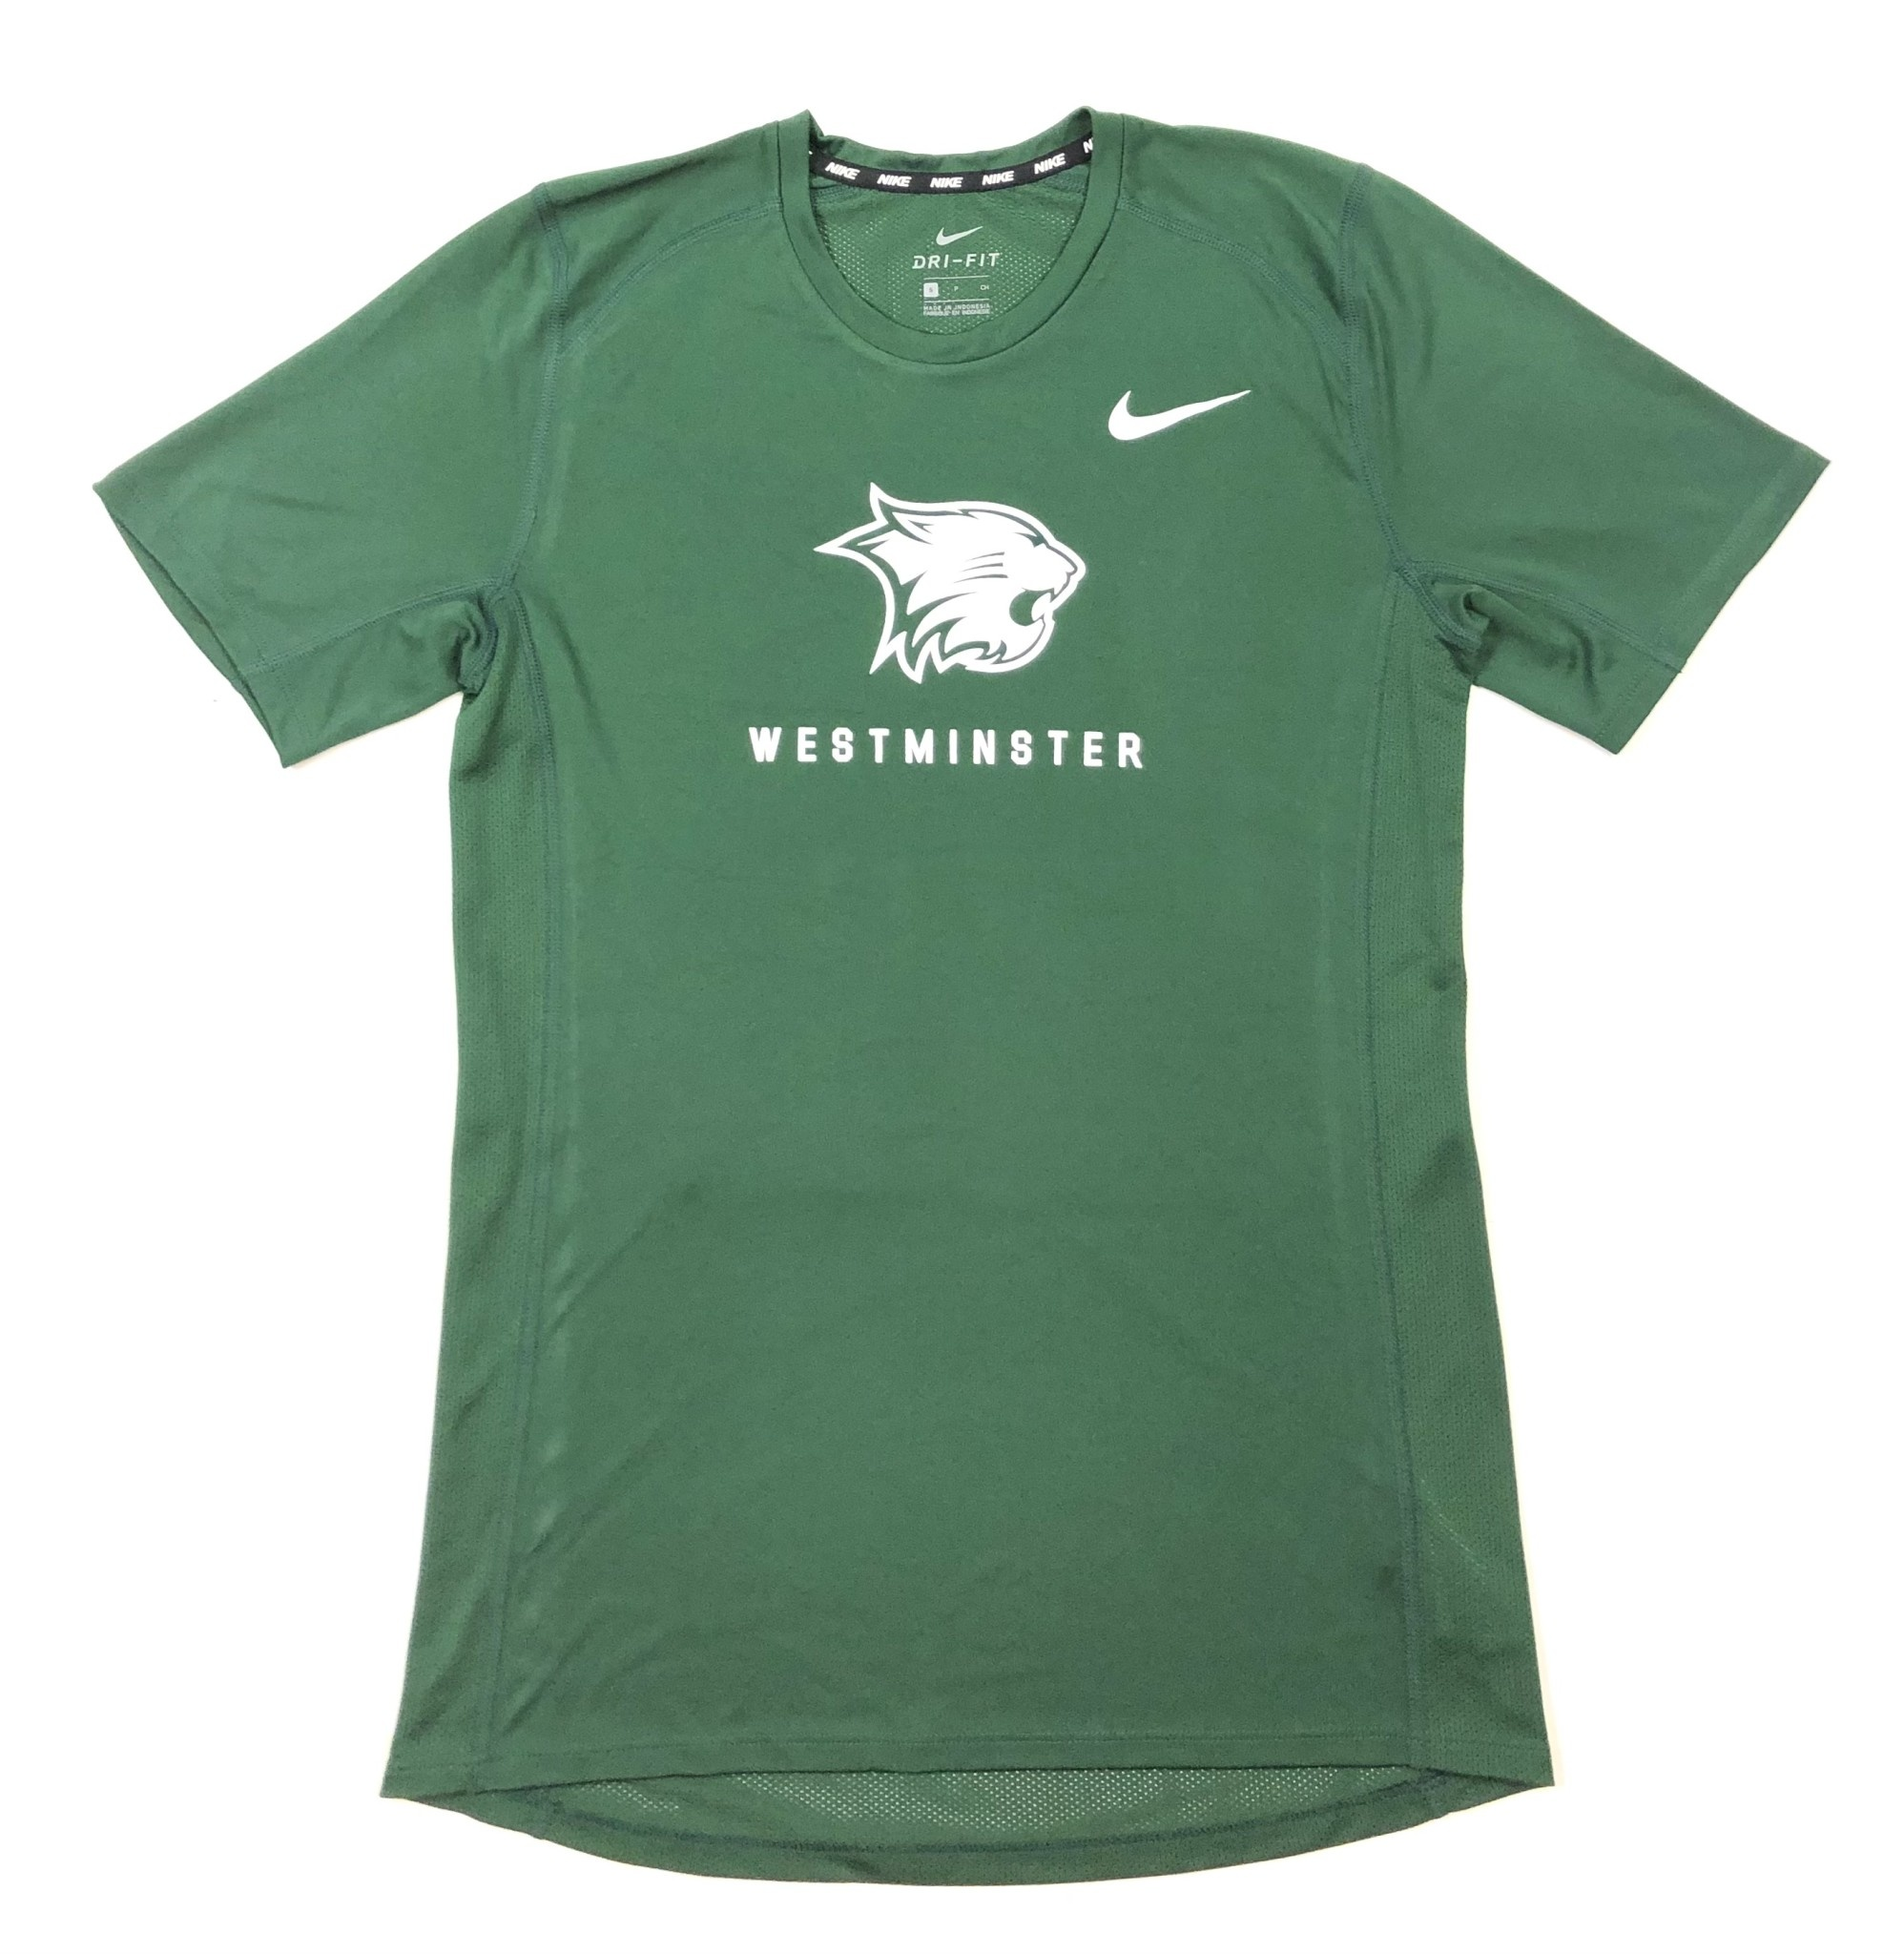 Nike T: Nike SS Dri-fit Miler Green